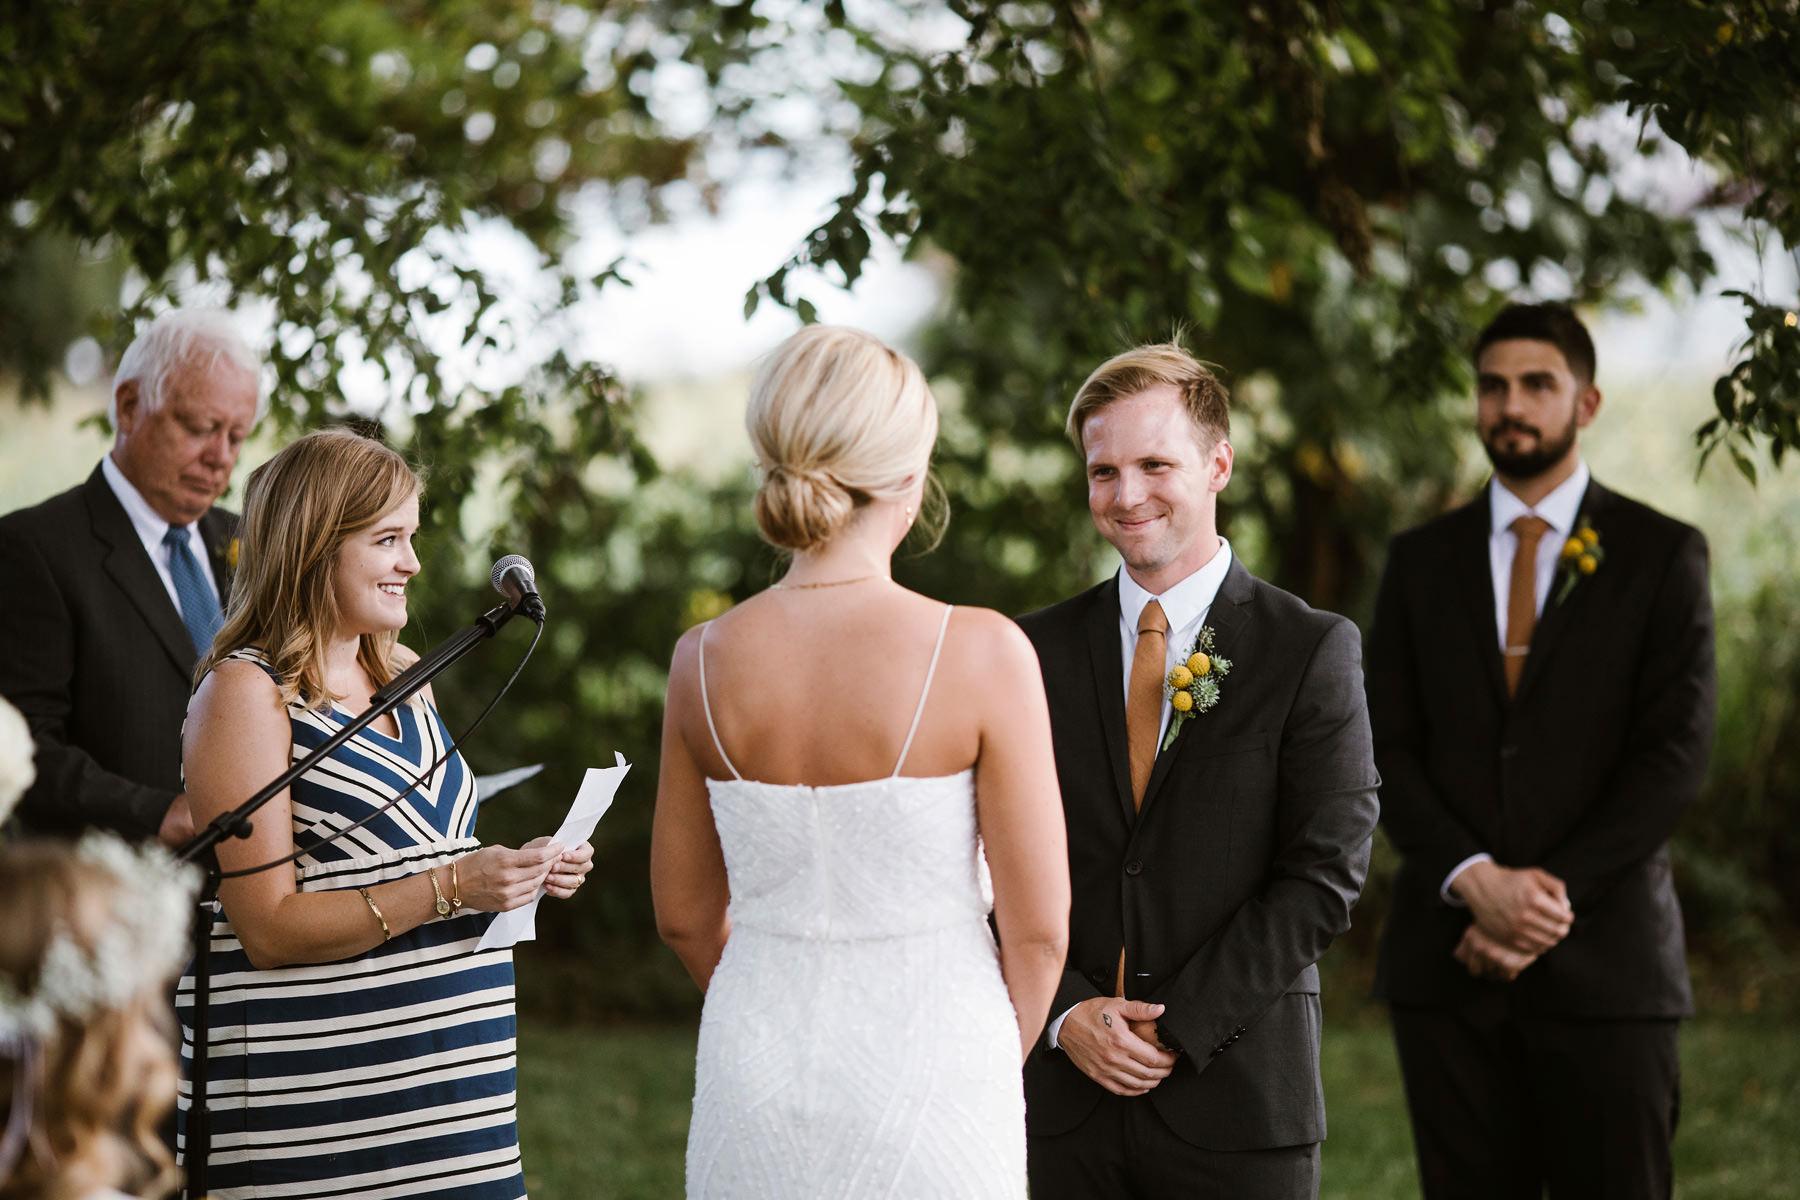 Alldredge Orchard Kansas City_Kindling Wedding Photography BLOG 43.JPG